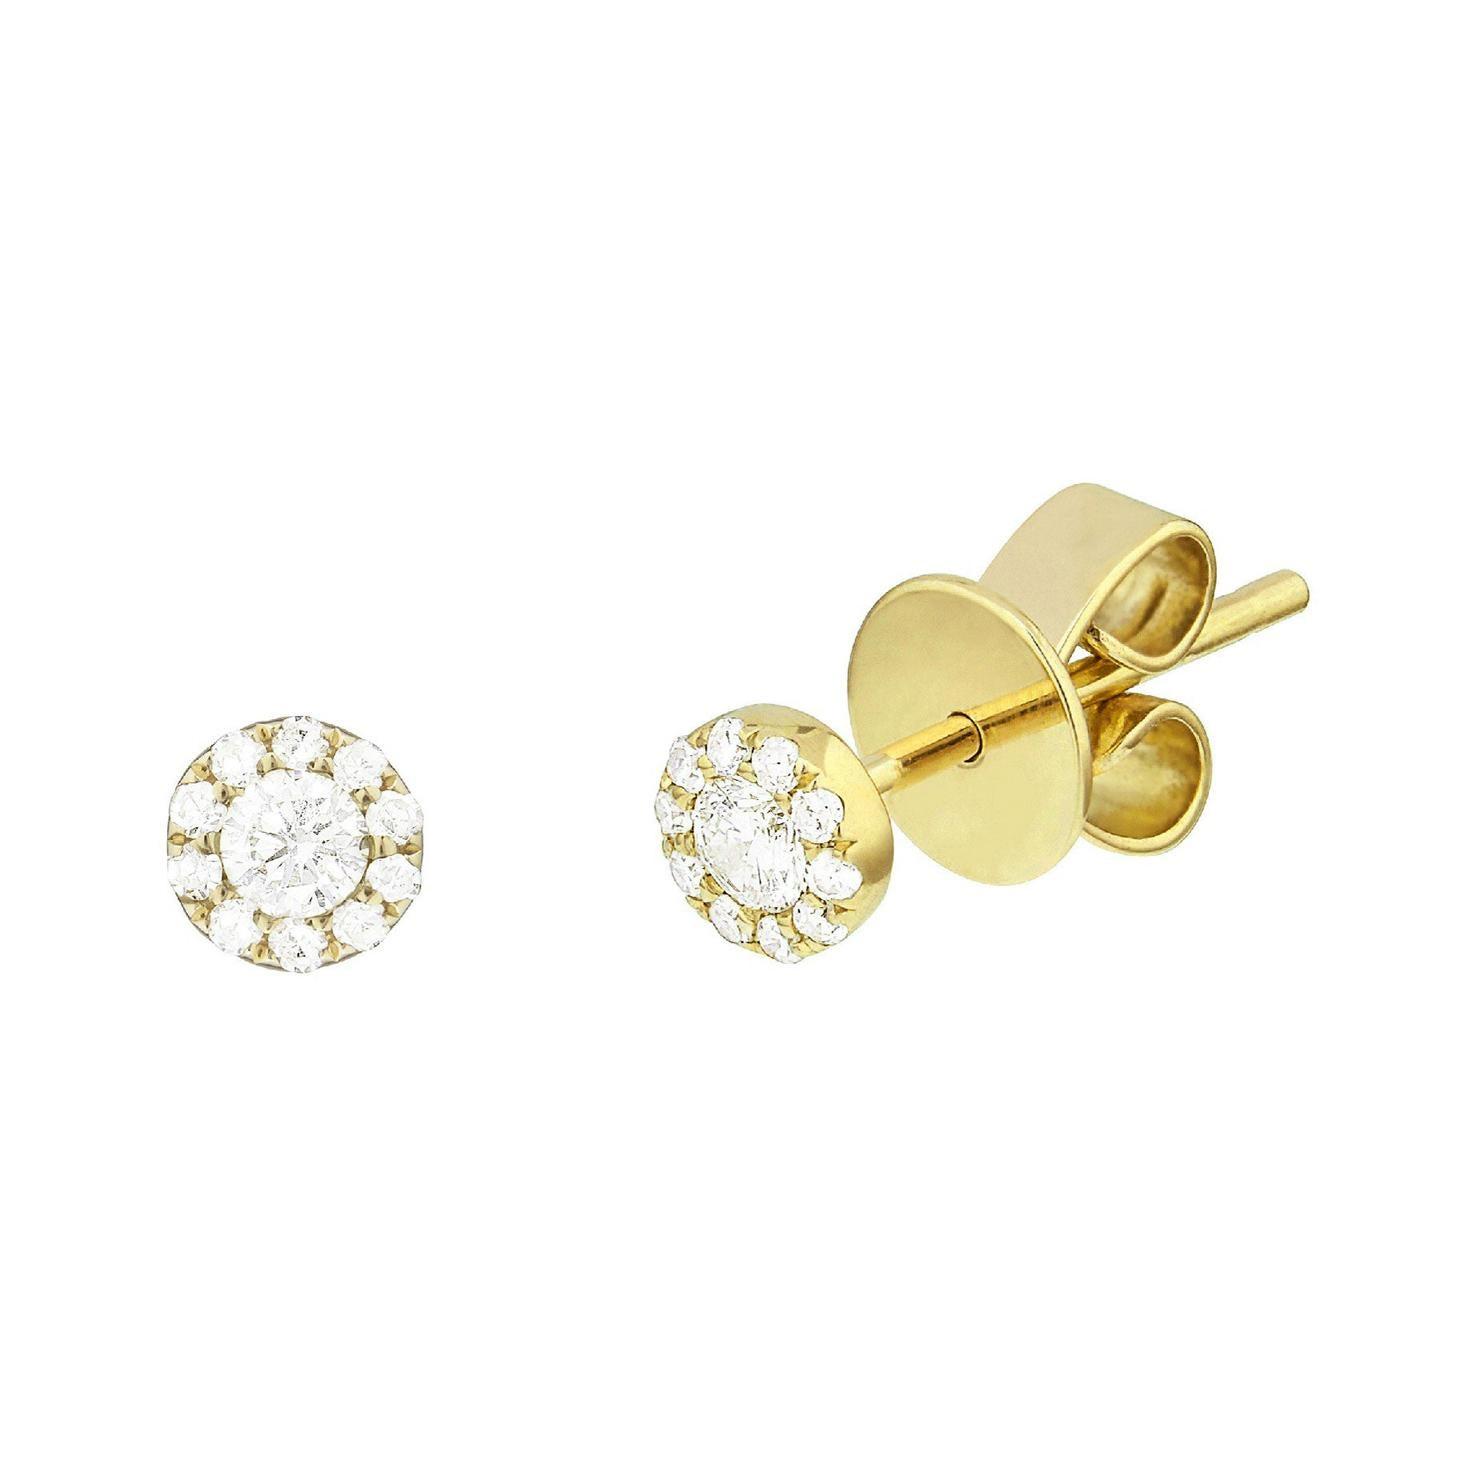 14 Karat Yellow Gold 0.115 Carat Diamond Cluster Earrings